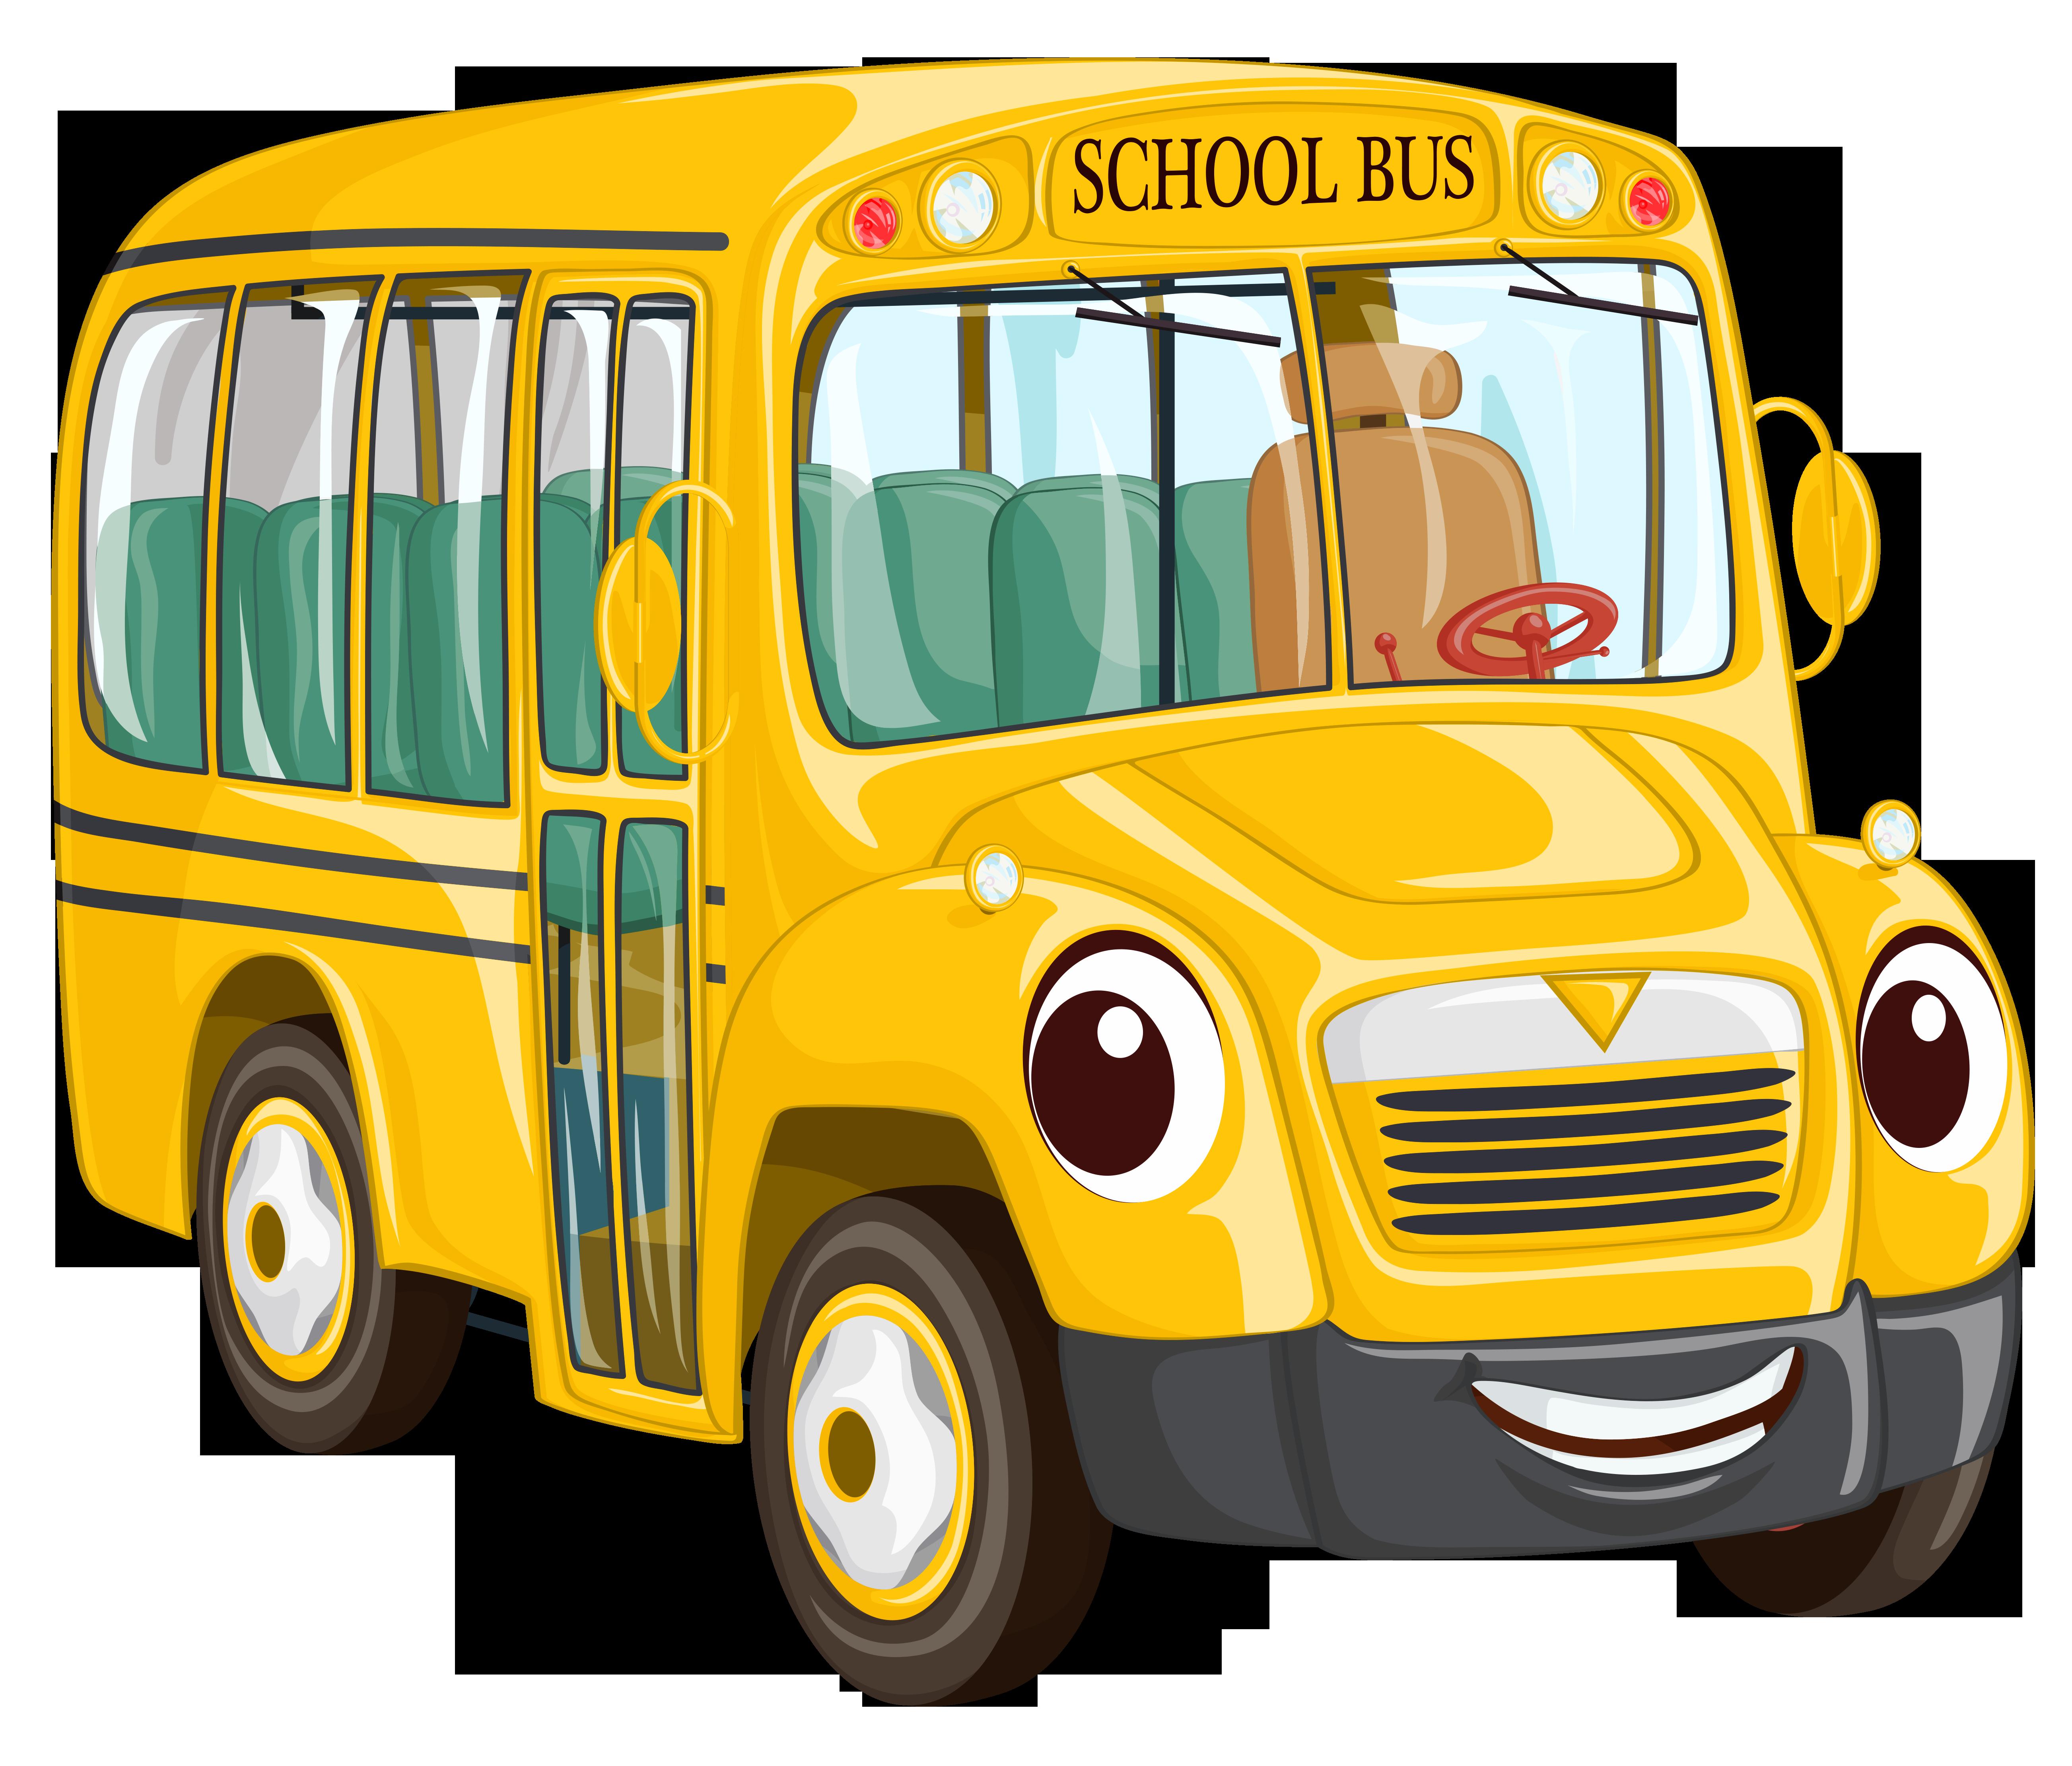 School bus clipart images 3 school bus clip art vector 5 2.